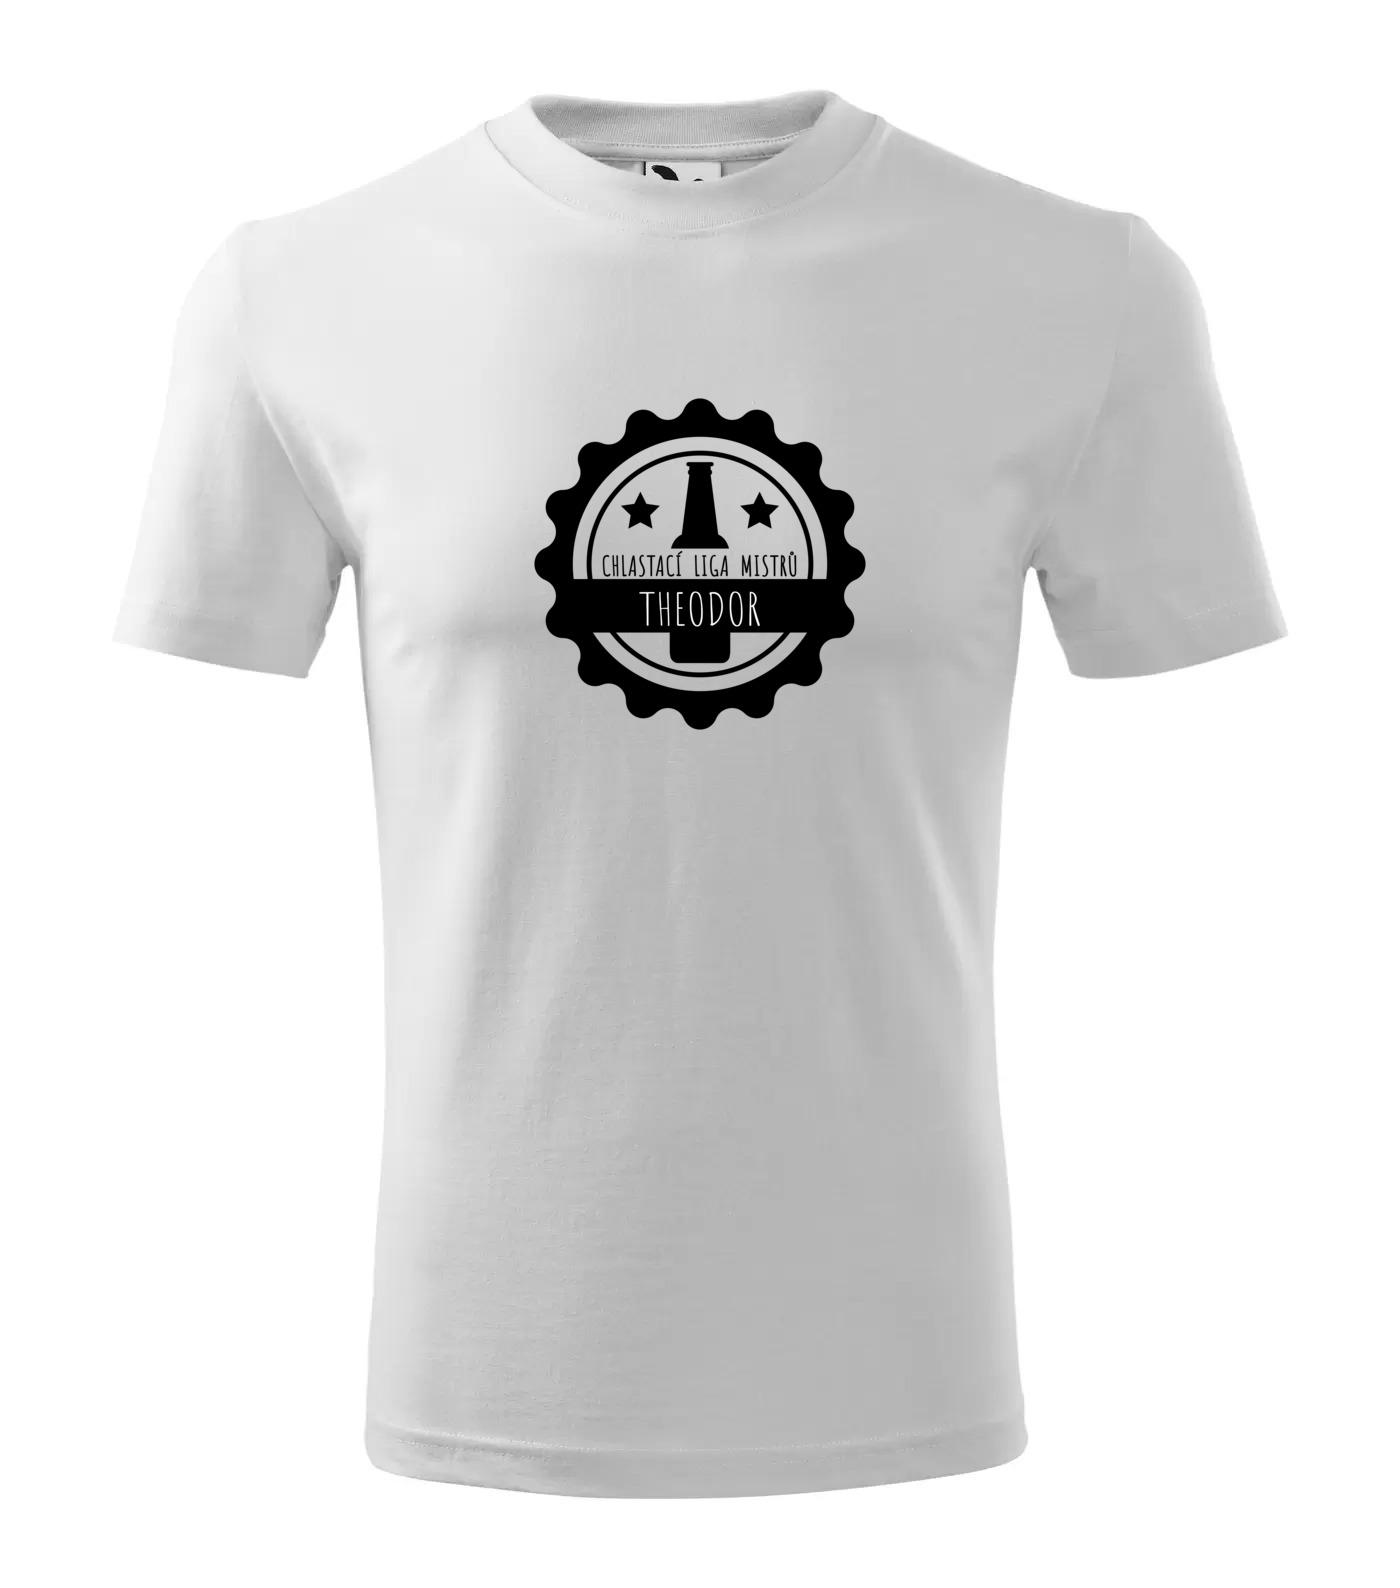 Tričko Chlastací liga mužů Theodor